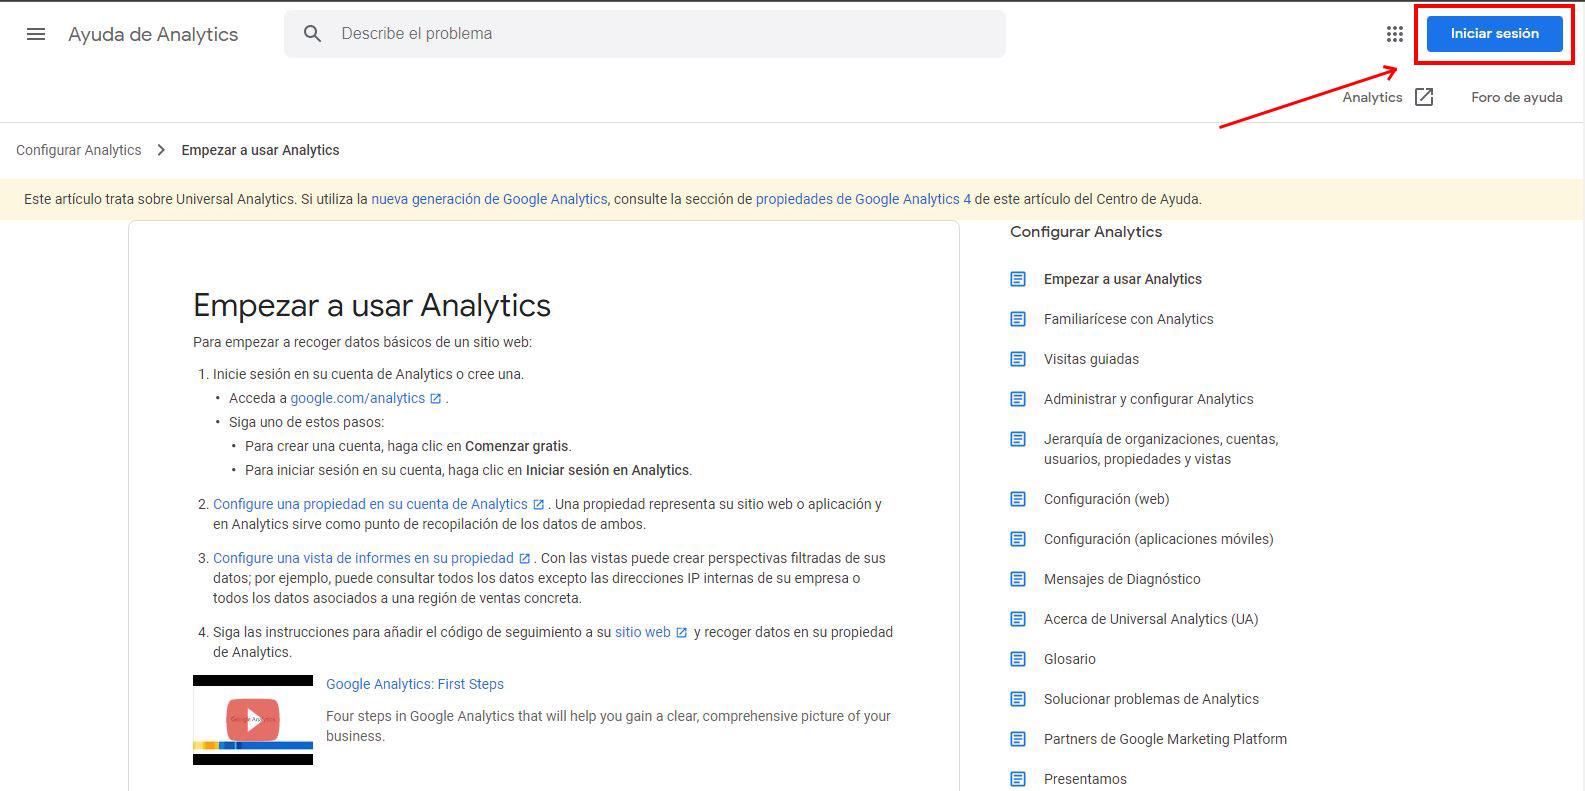 Inicio de sesión Google Analytics 4